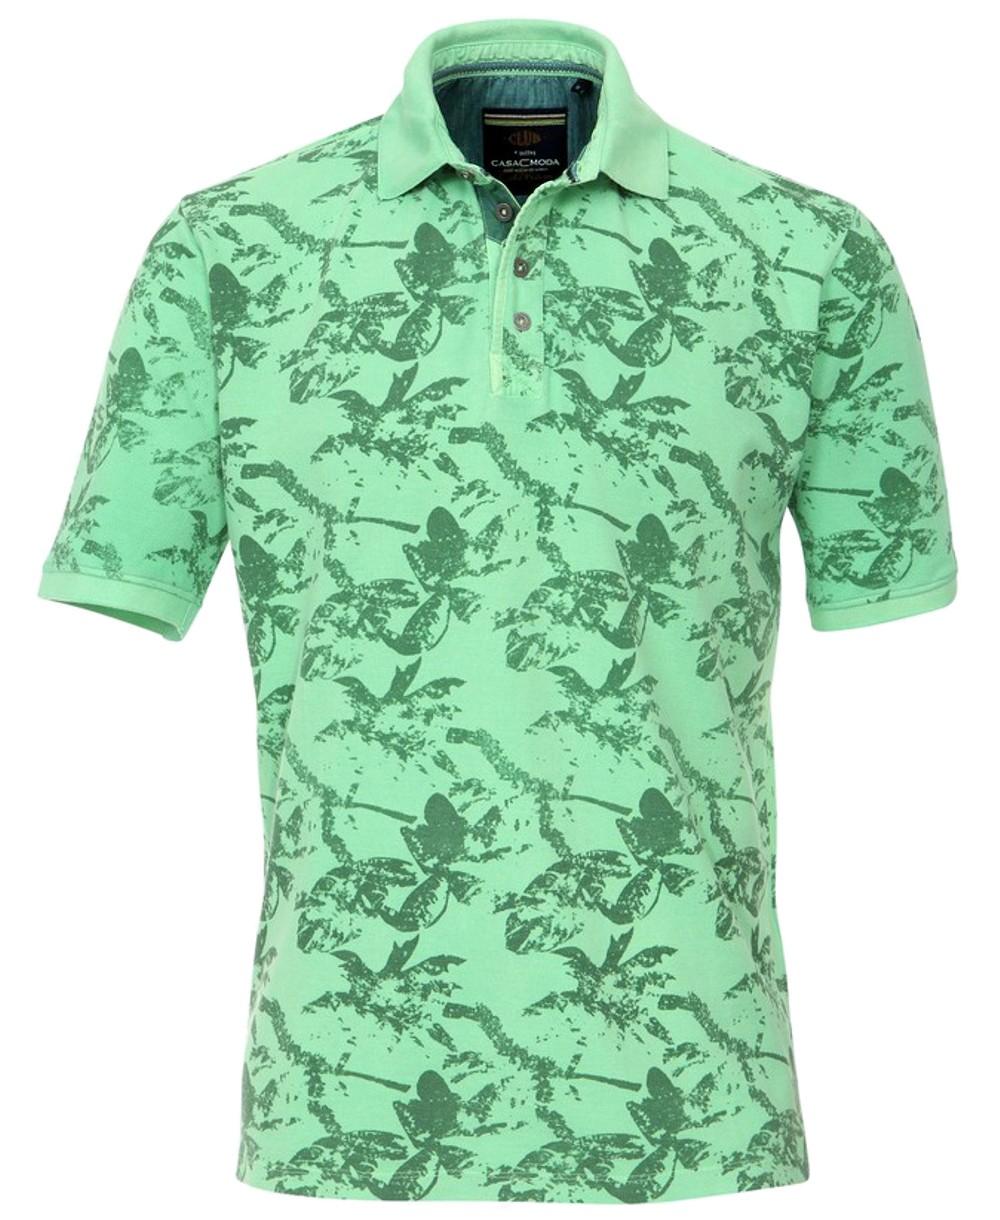 casa moda polo shirt floral 962384600 326 hochwertige herrenmode f hrender marken zu fairen. Black Bedroom Furniture Sets. Home Design Ideas